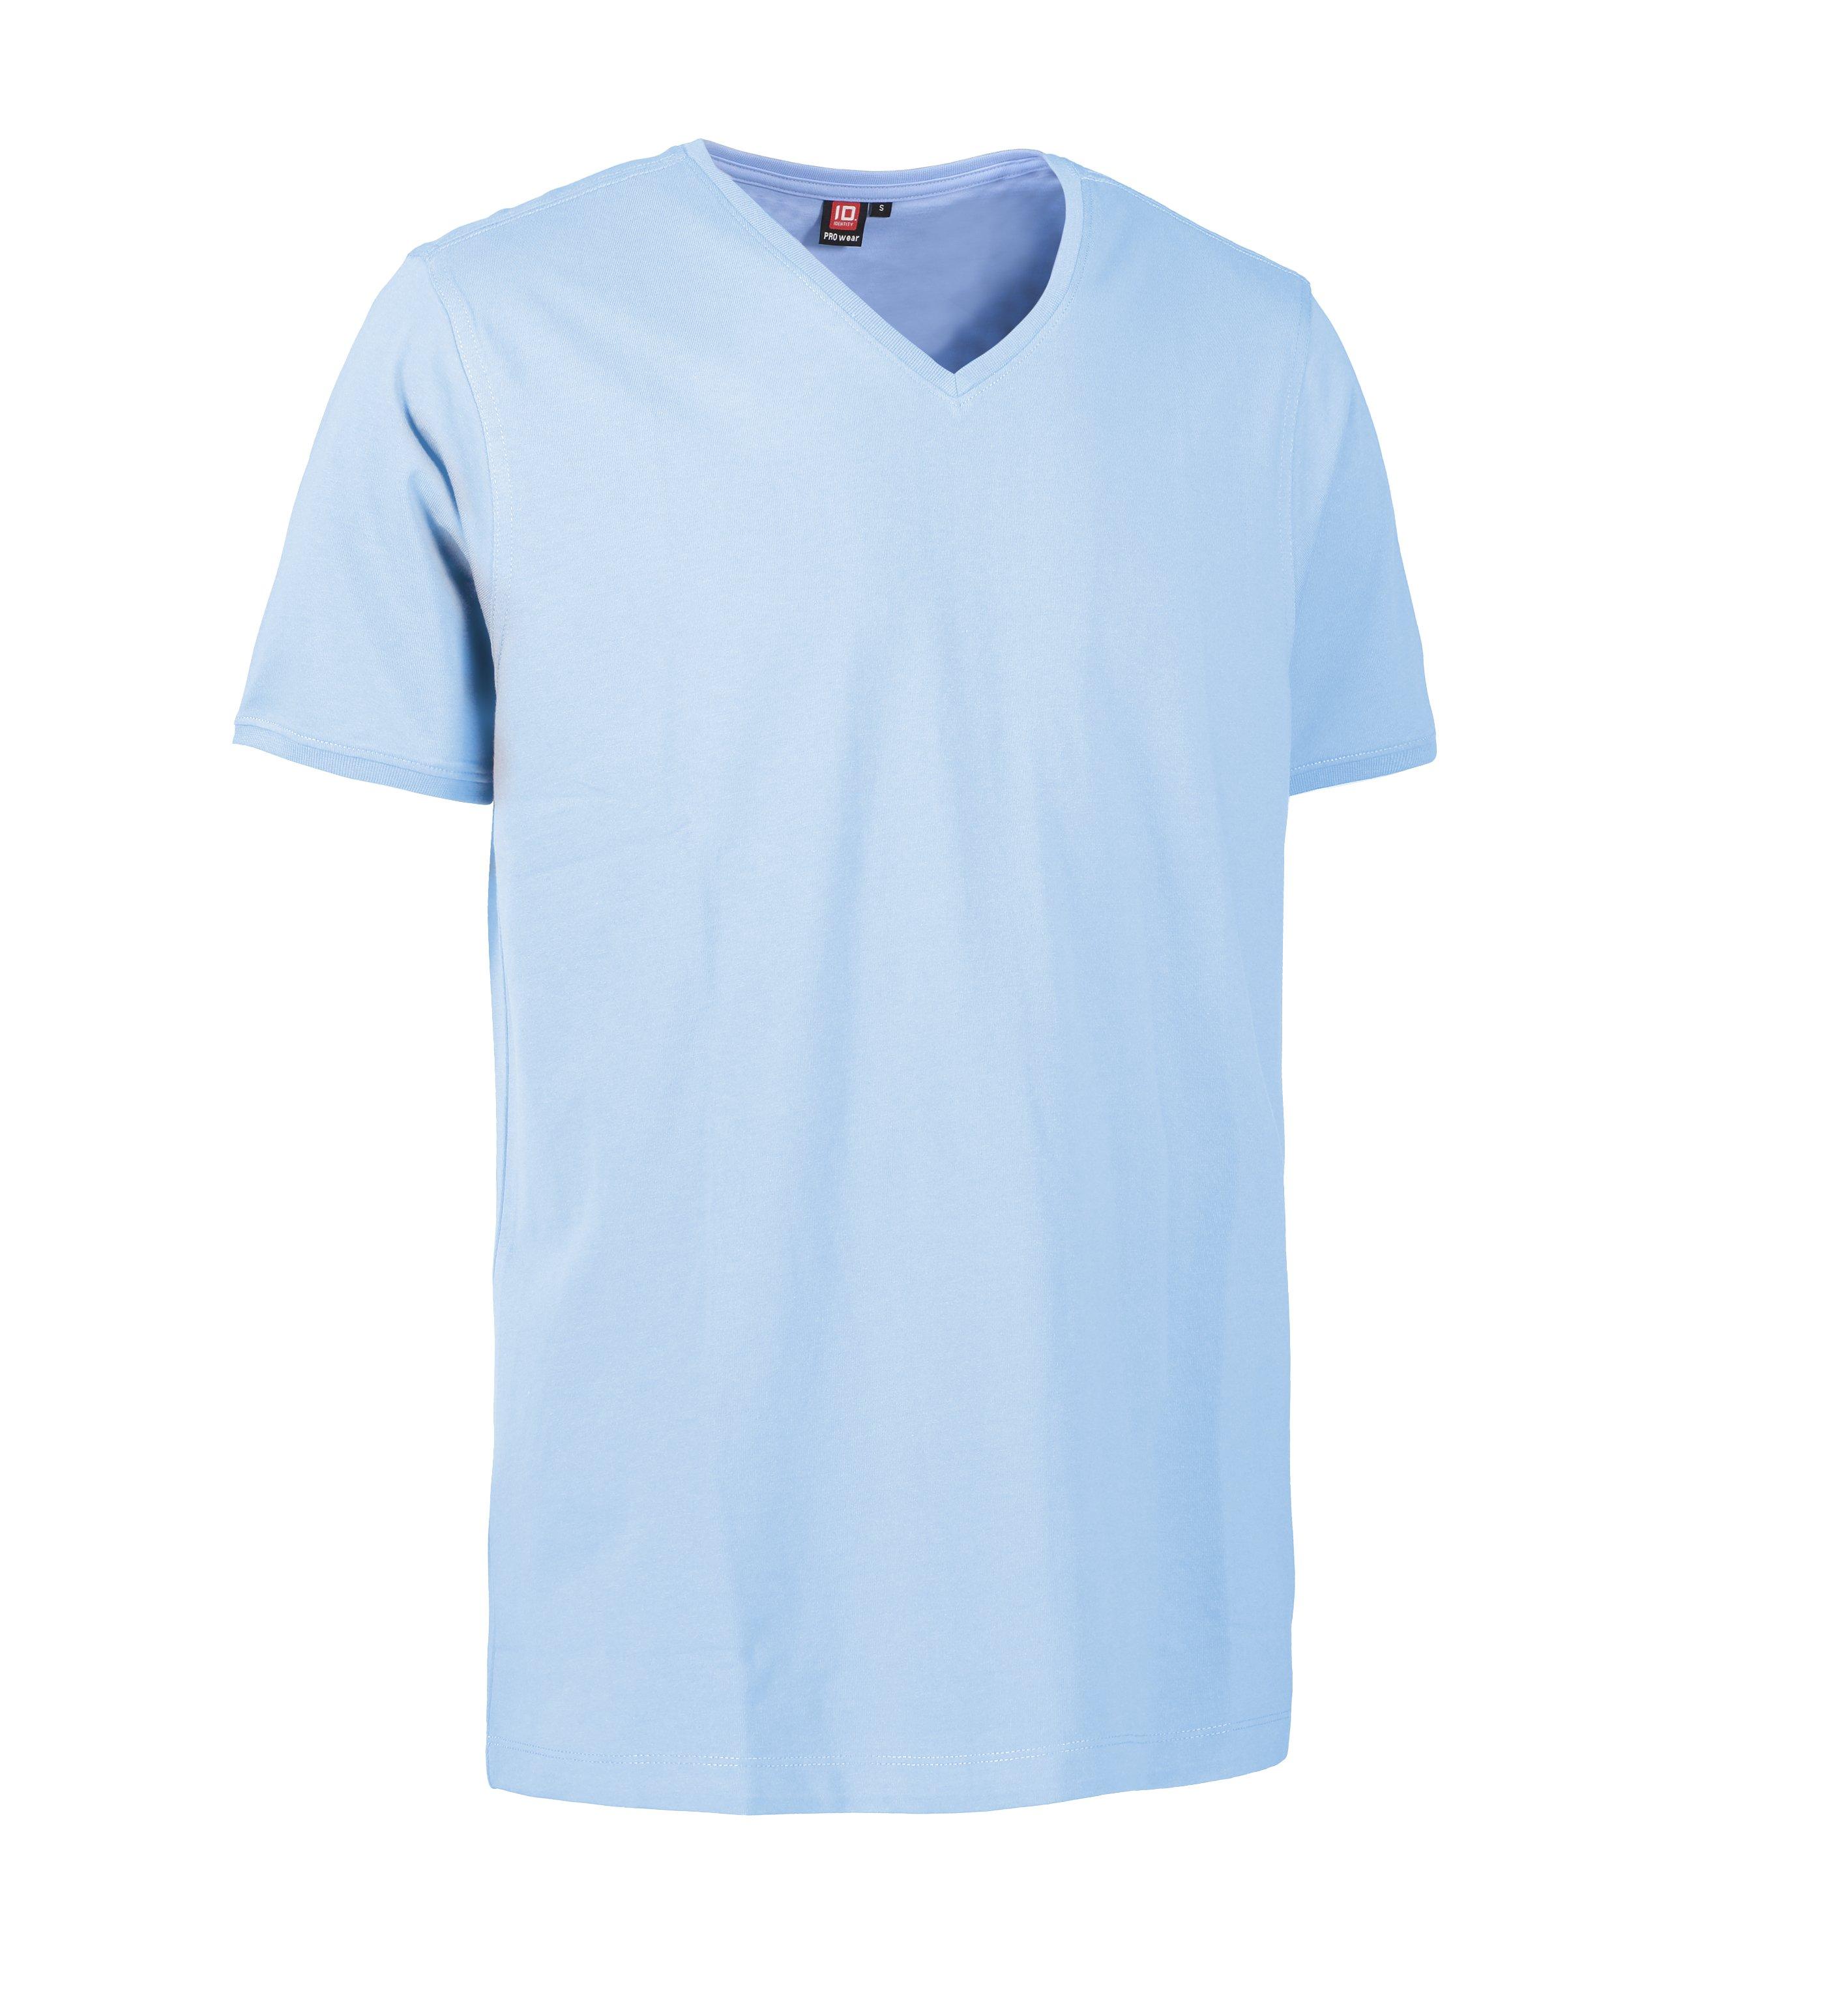 ID PRO Wear CARE V hals herre T shirt 0372